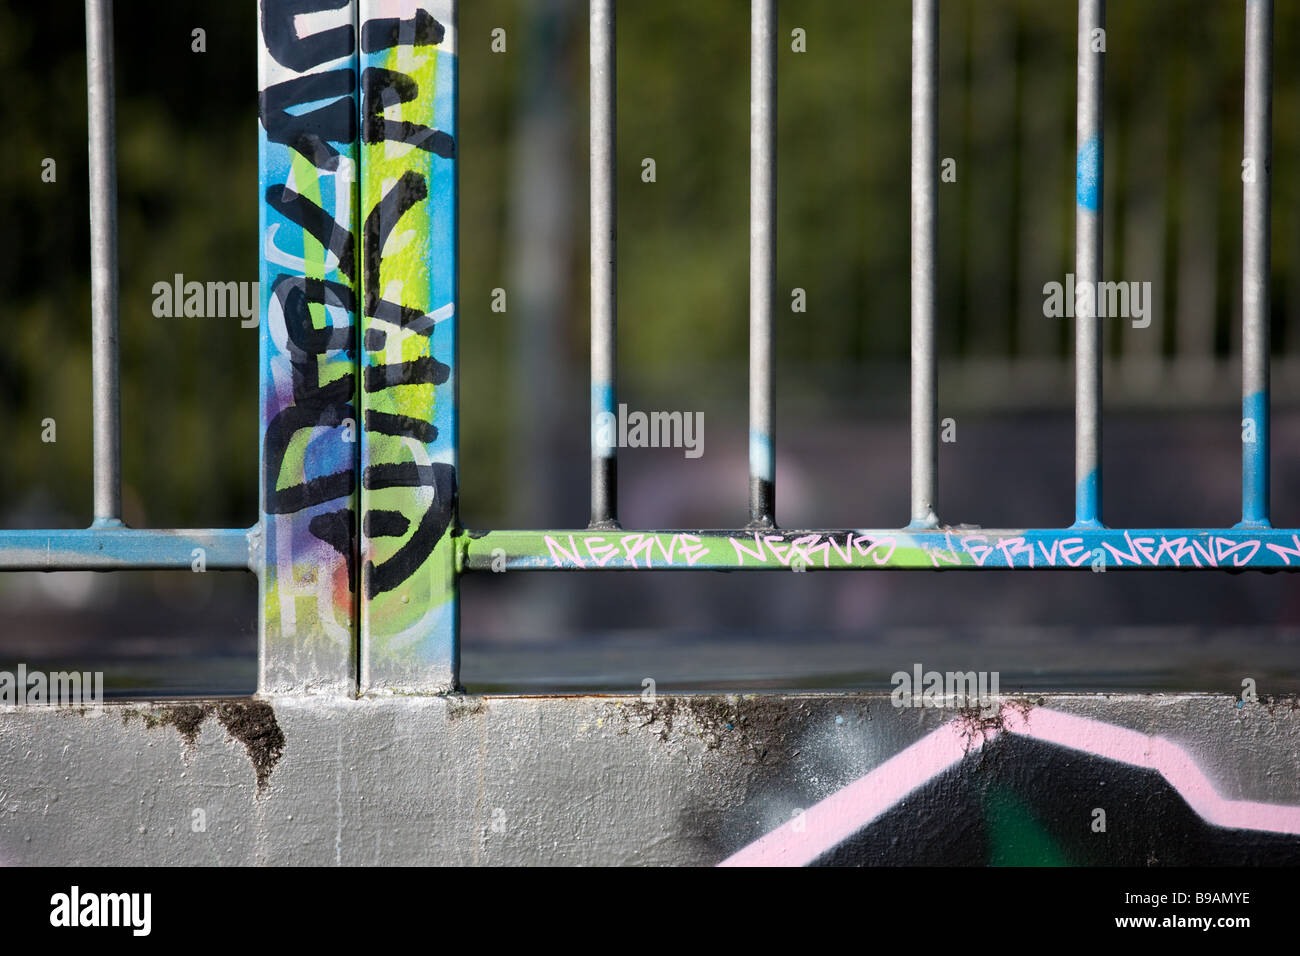 graffiti on steelwork - Stock Image